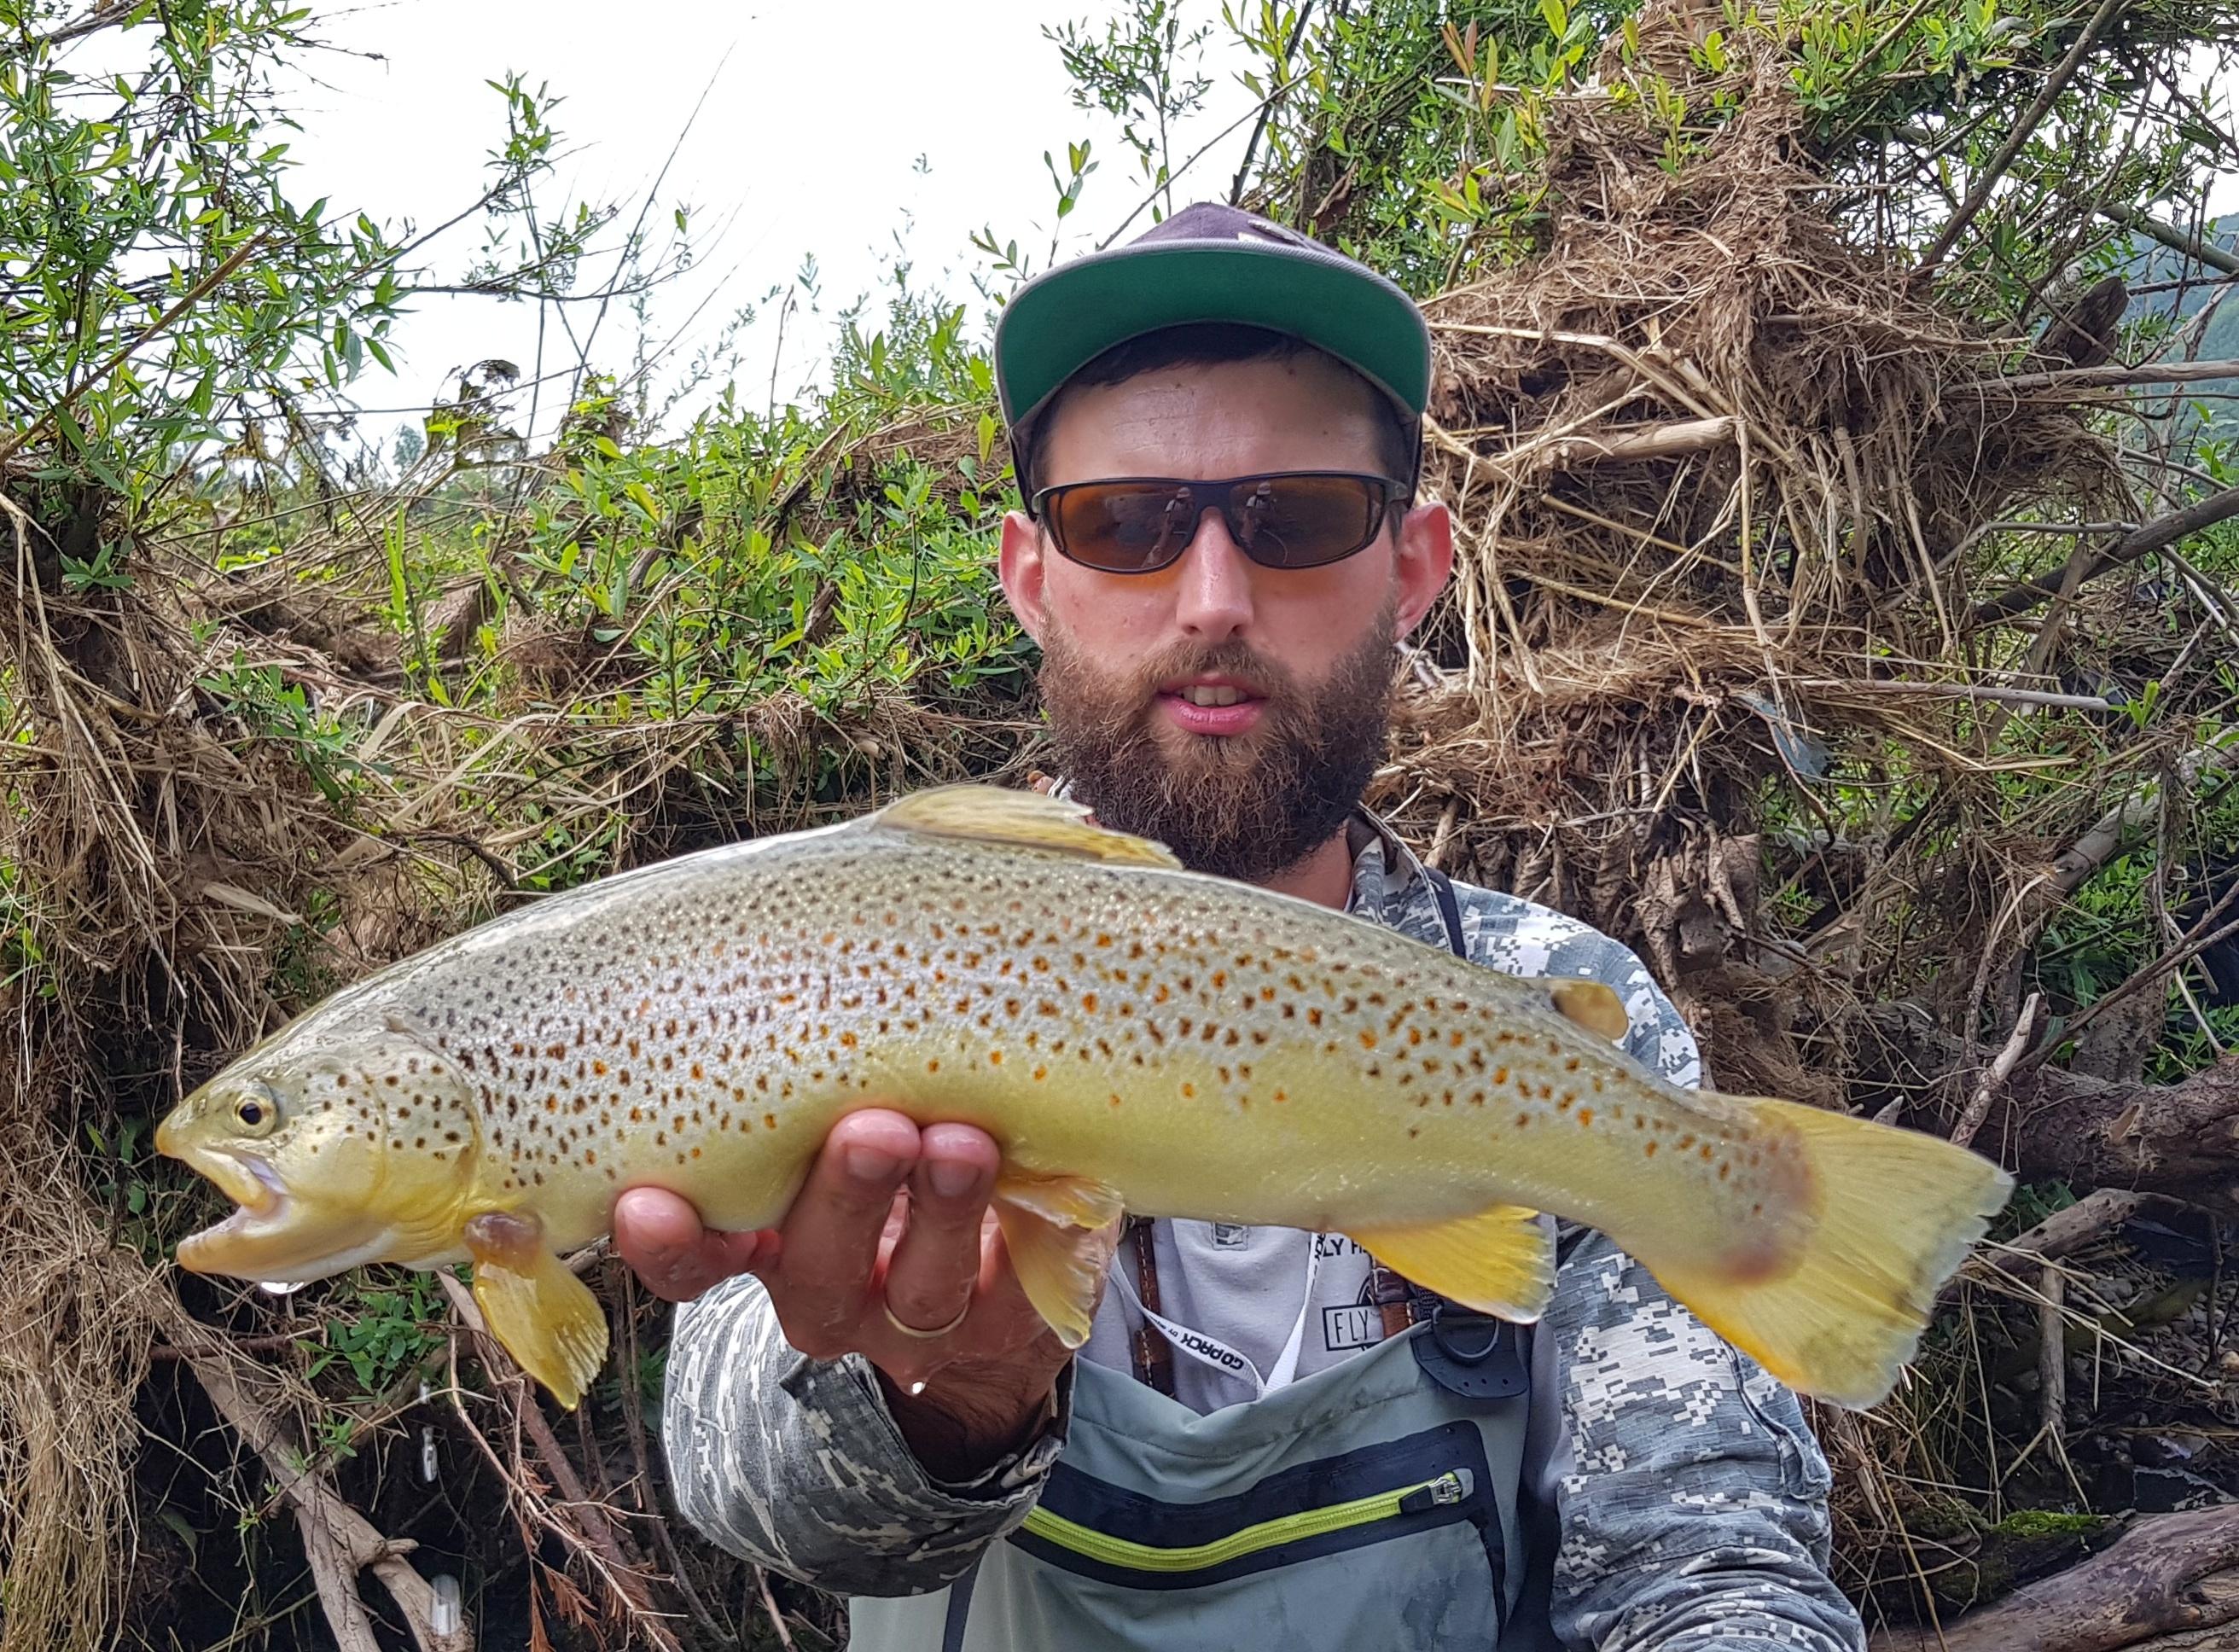 Bialka River - No kill zone & fat trout